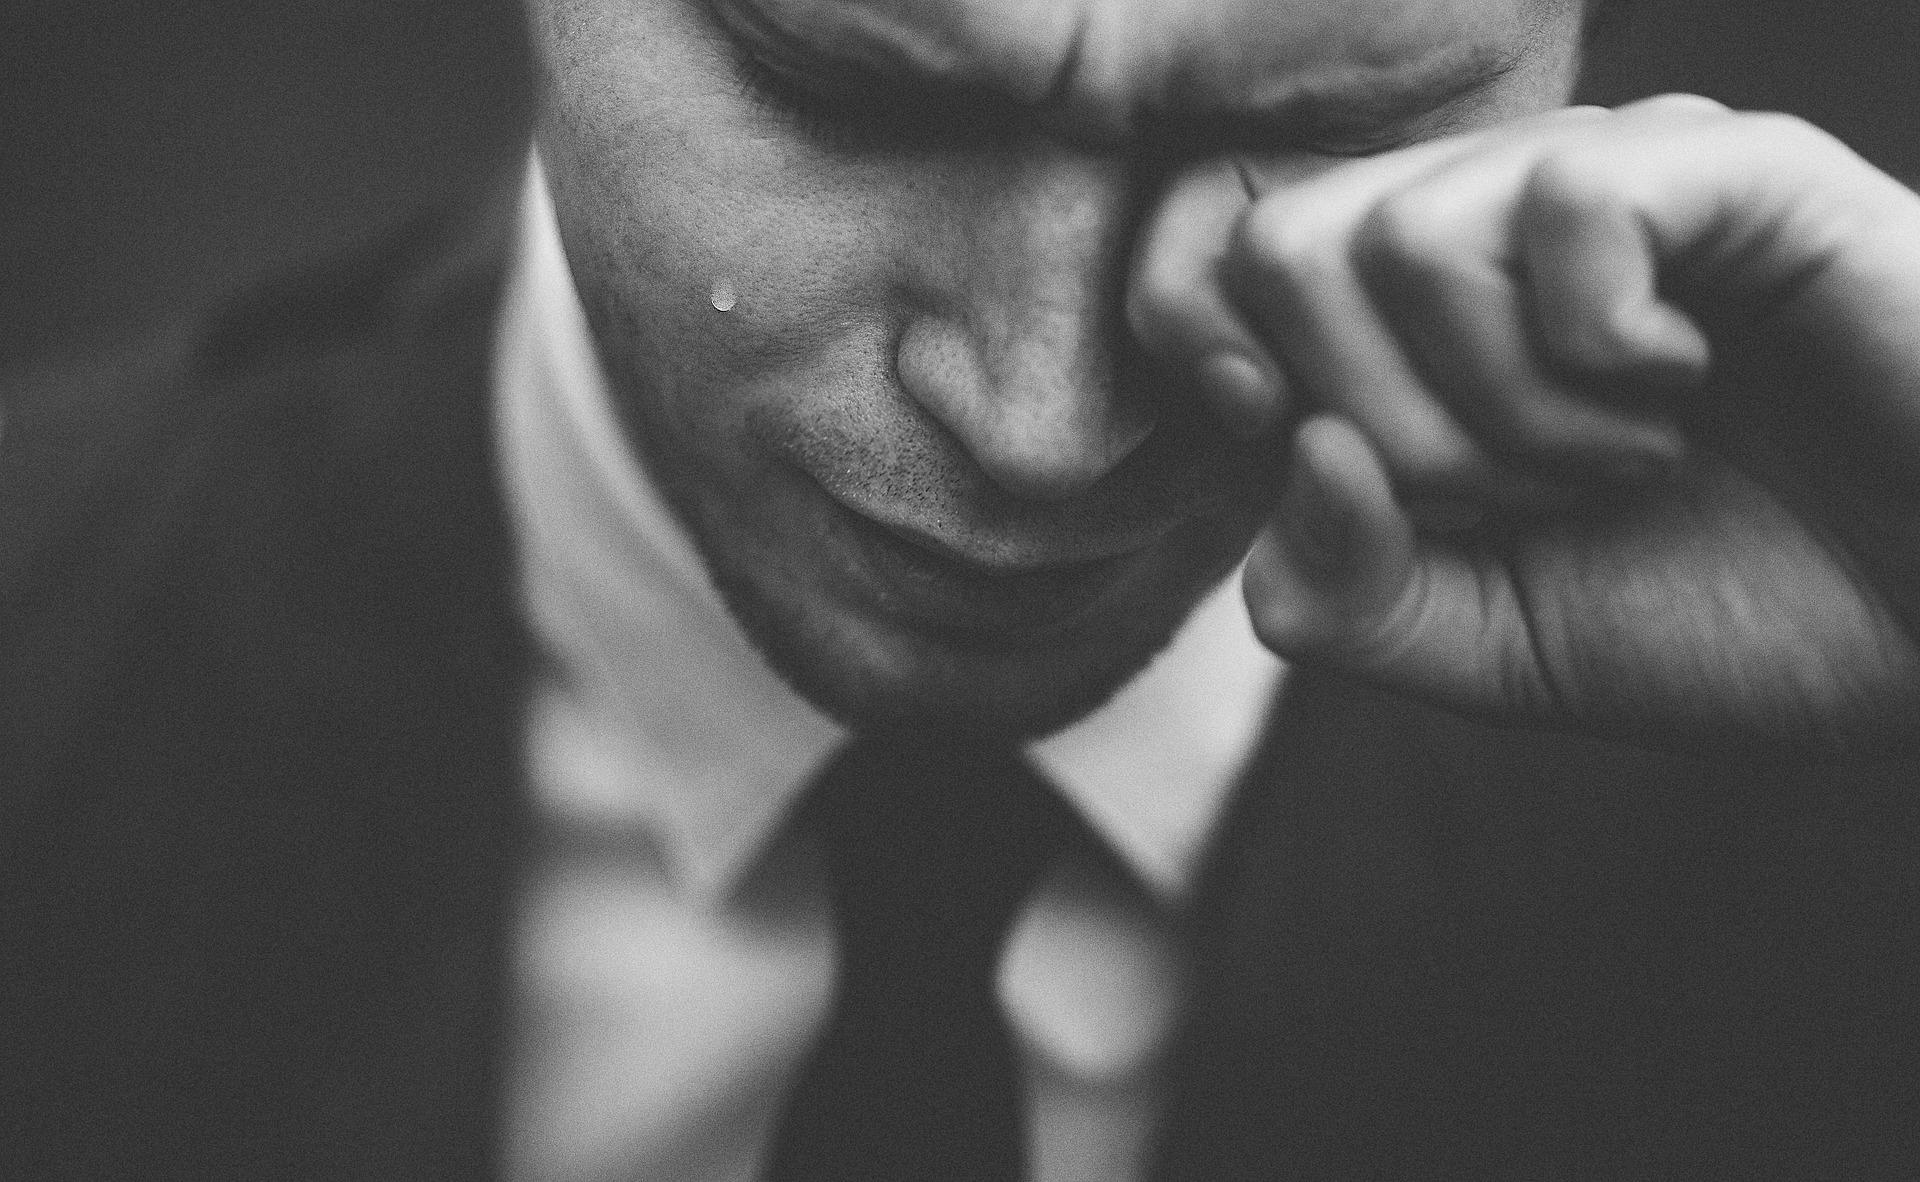 думаю, картинка как мужчина плачет бравый